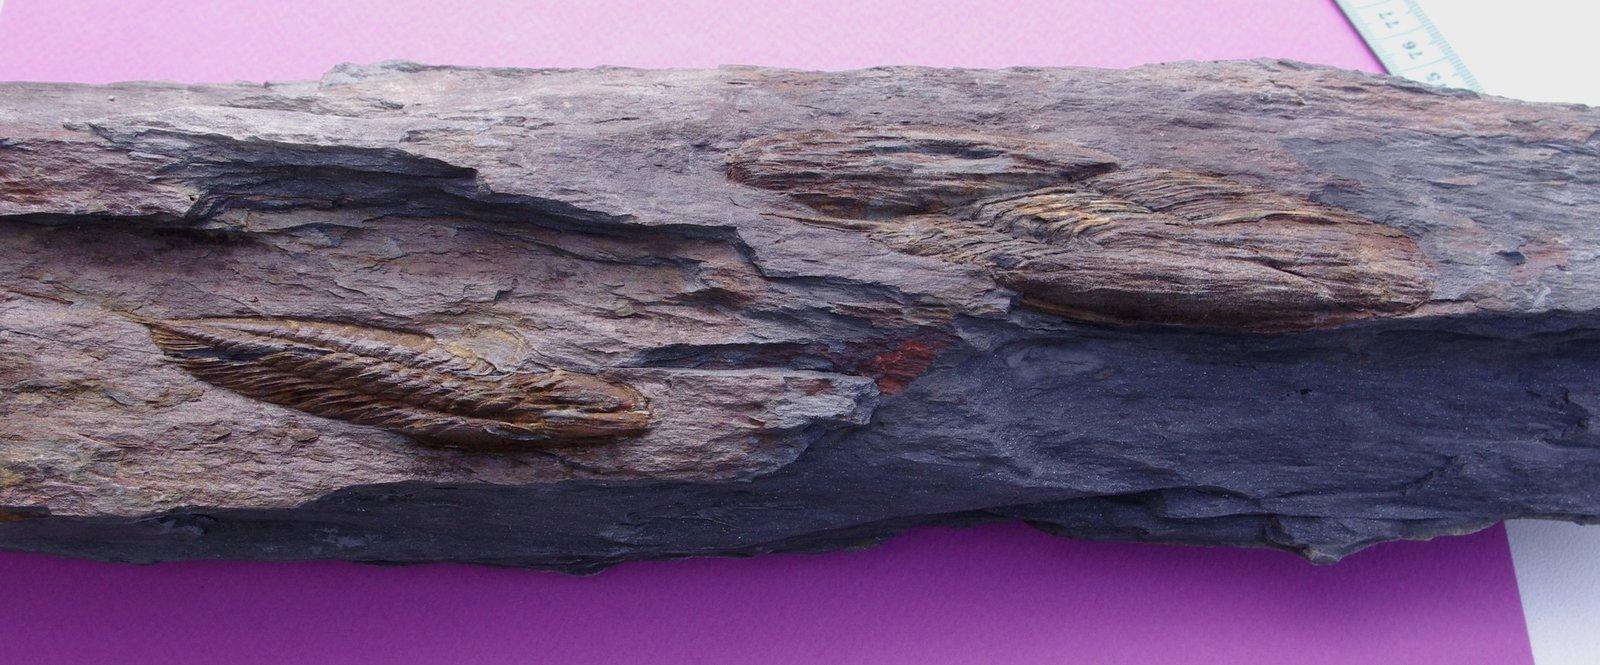 Association of Ectillaenus giganteus and Eodalmanitina Sp - before preparation